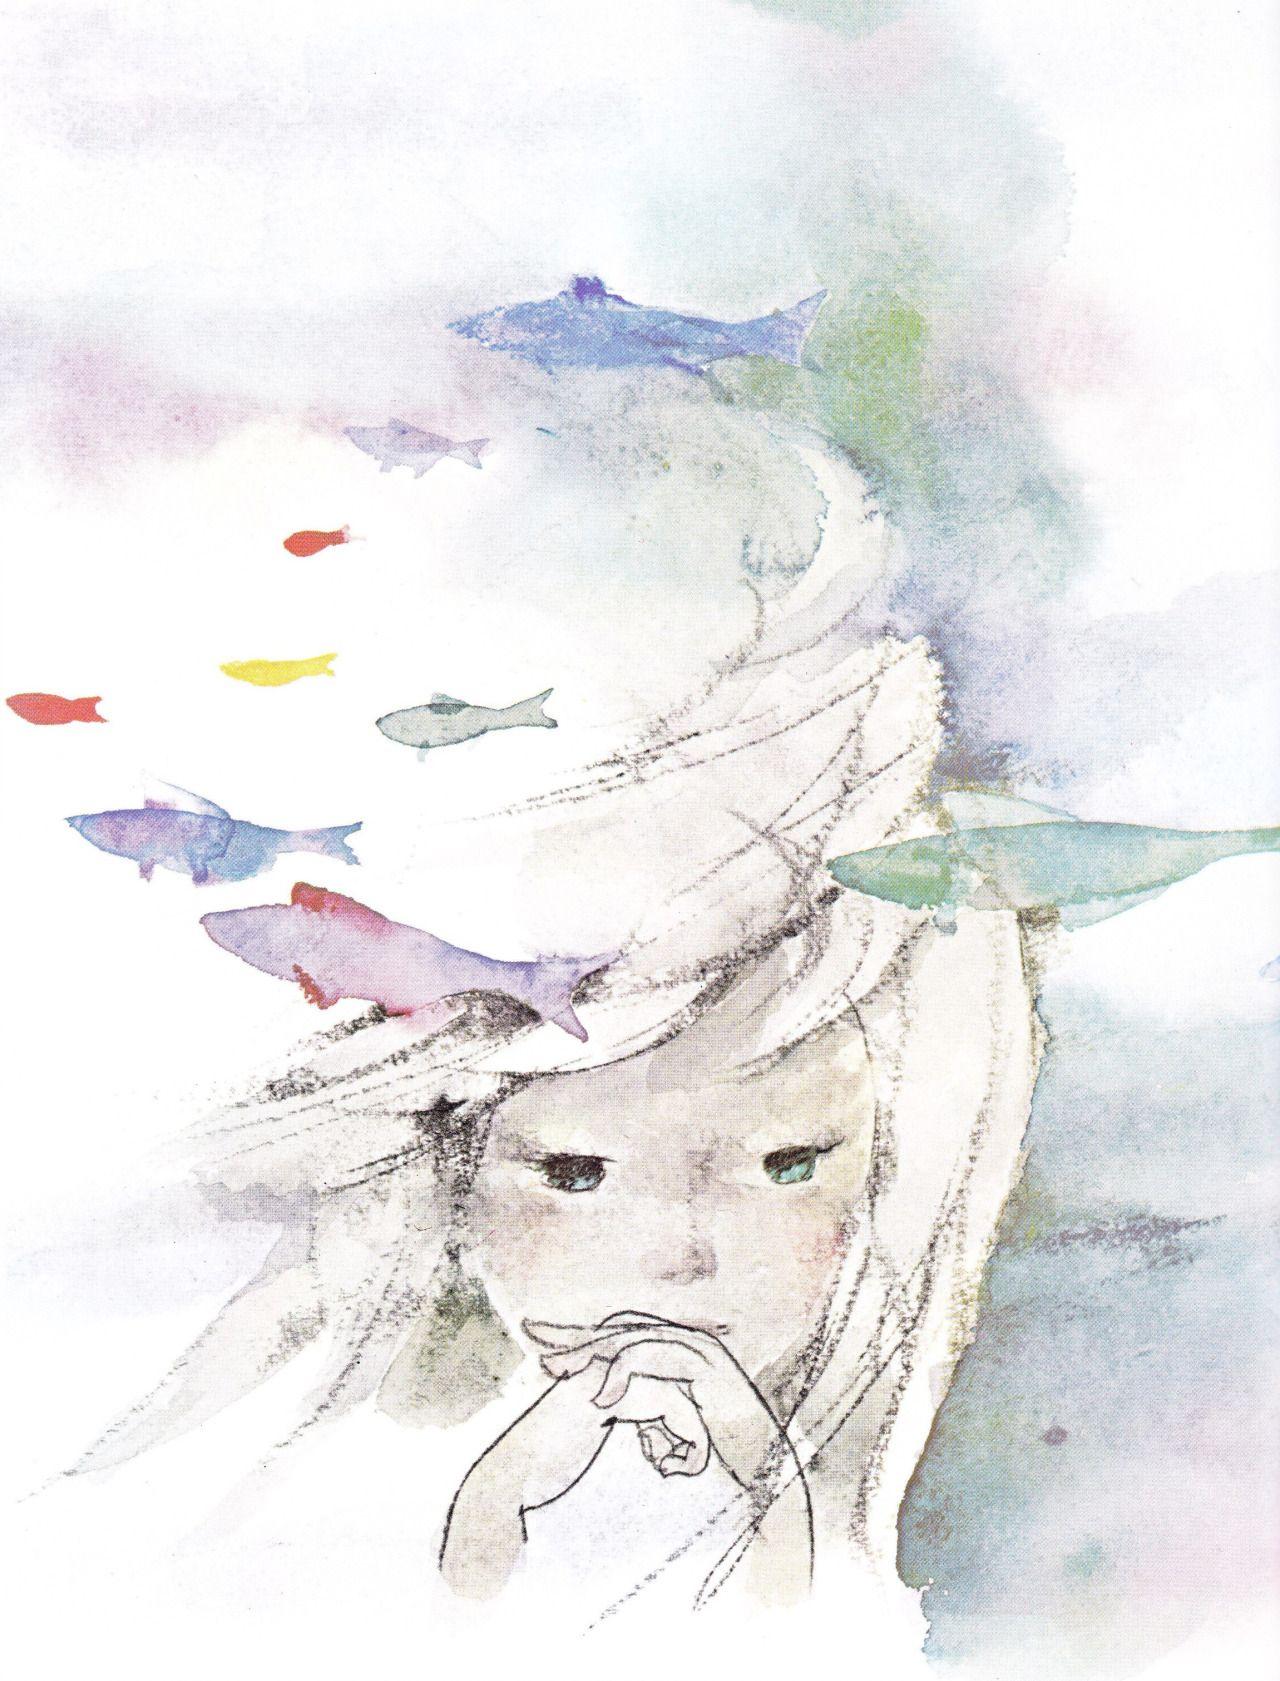 Chihiro Iwasaki Tumblr Mermaid Art Art Illustration